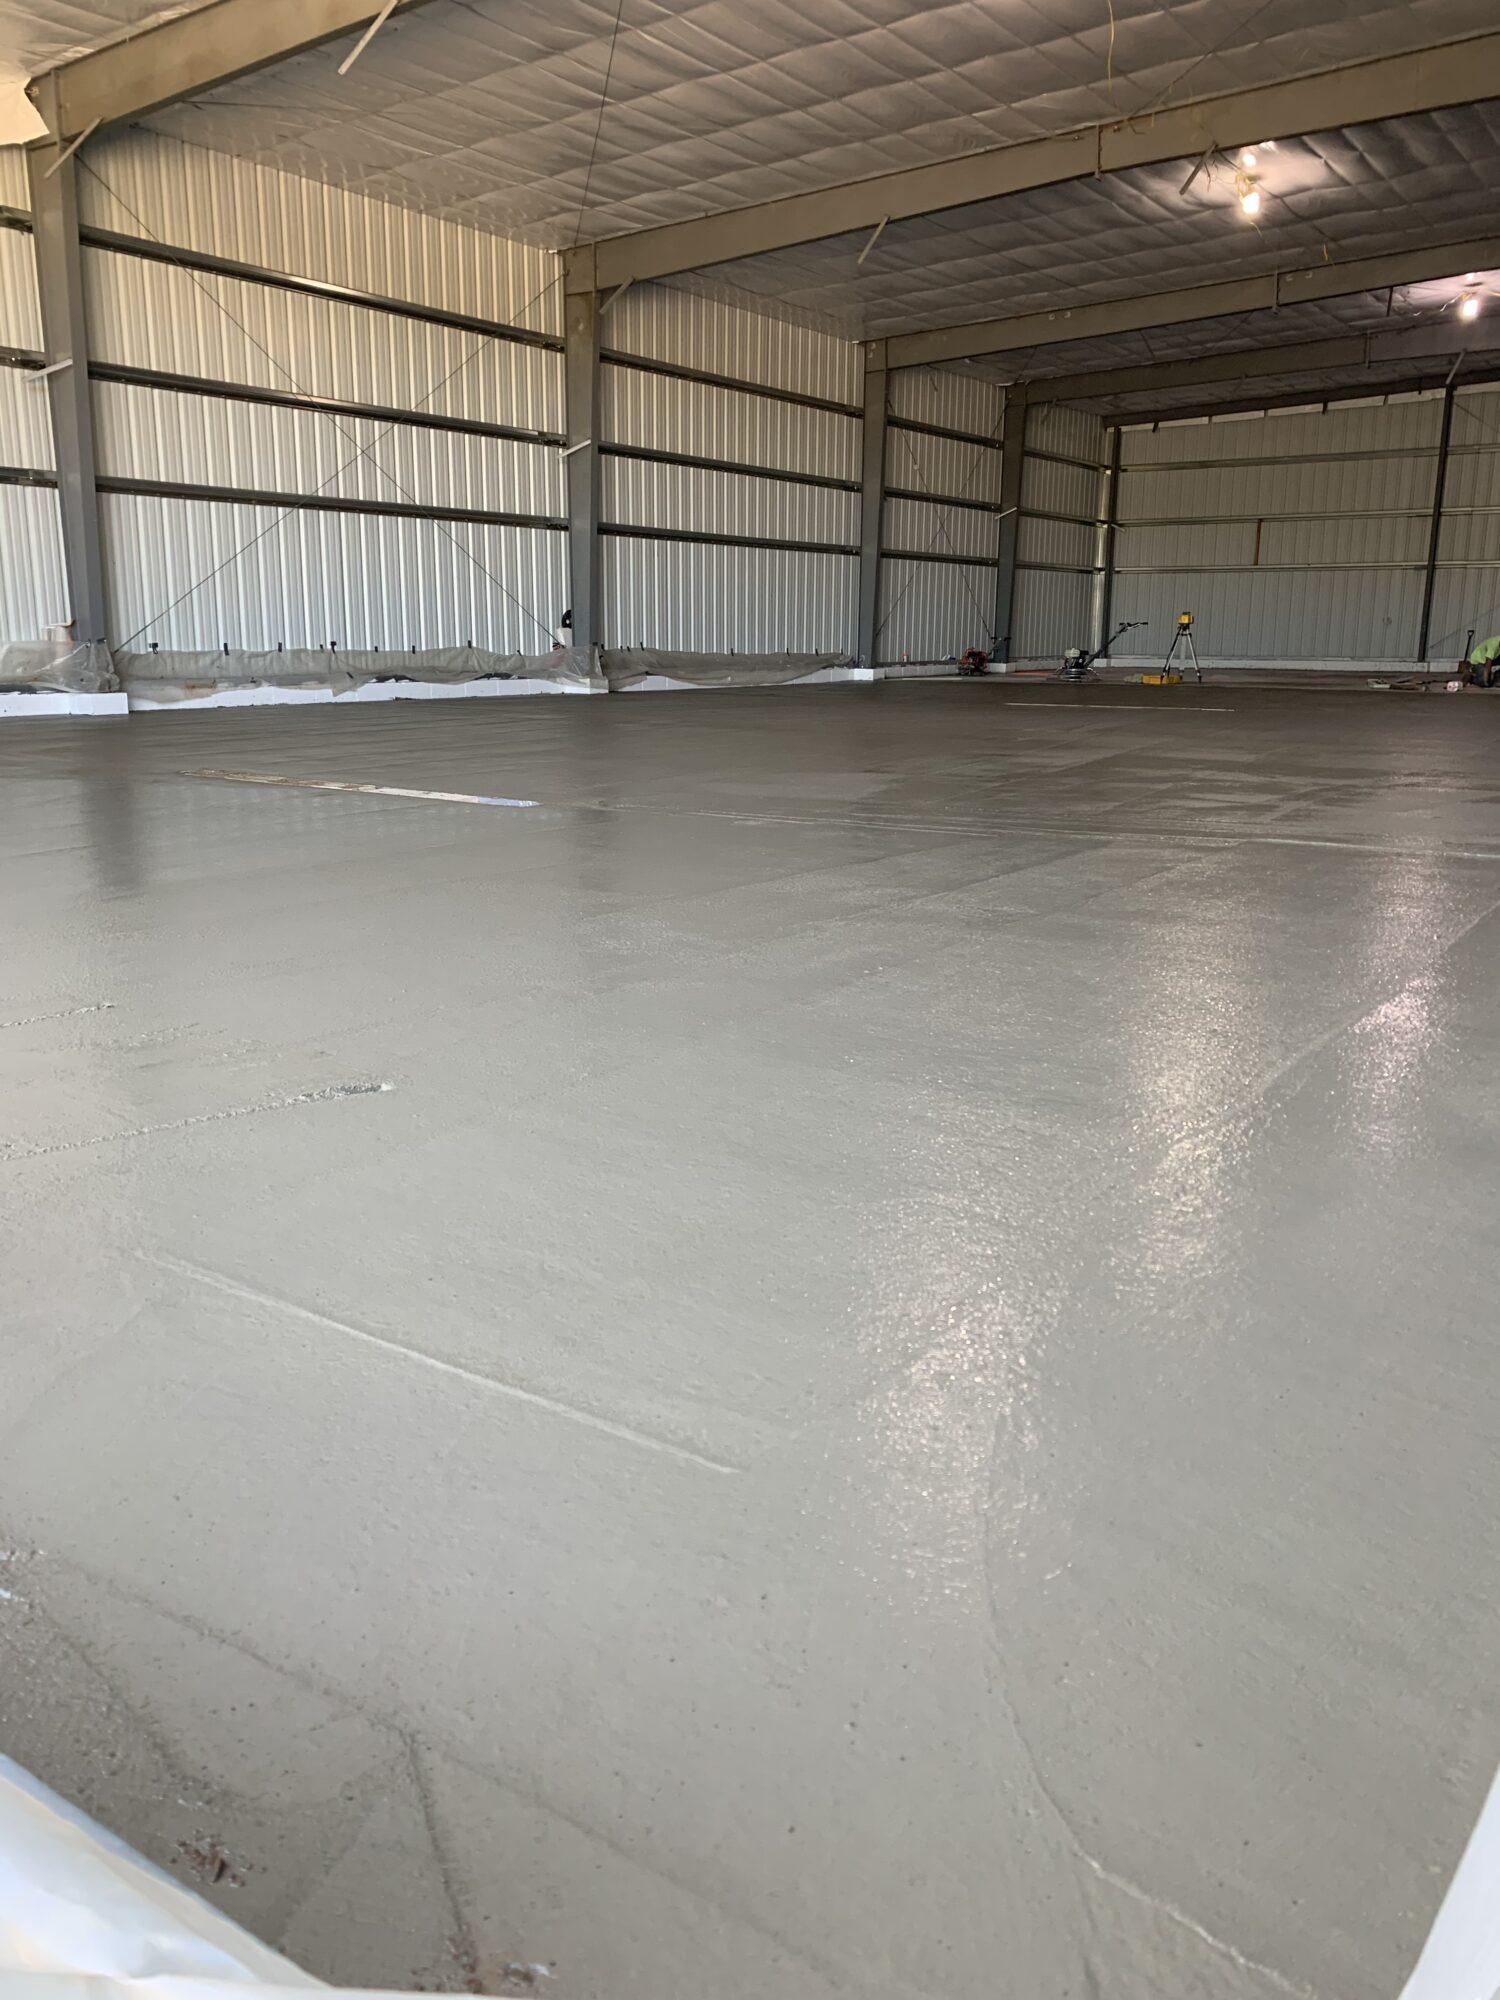 Concrete floor poured